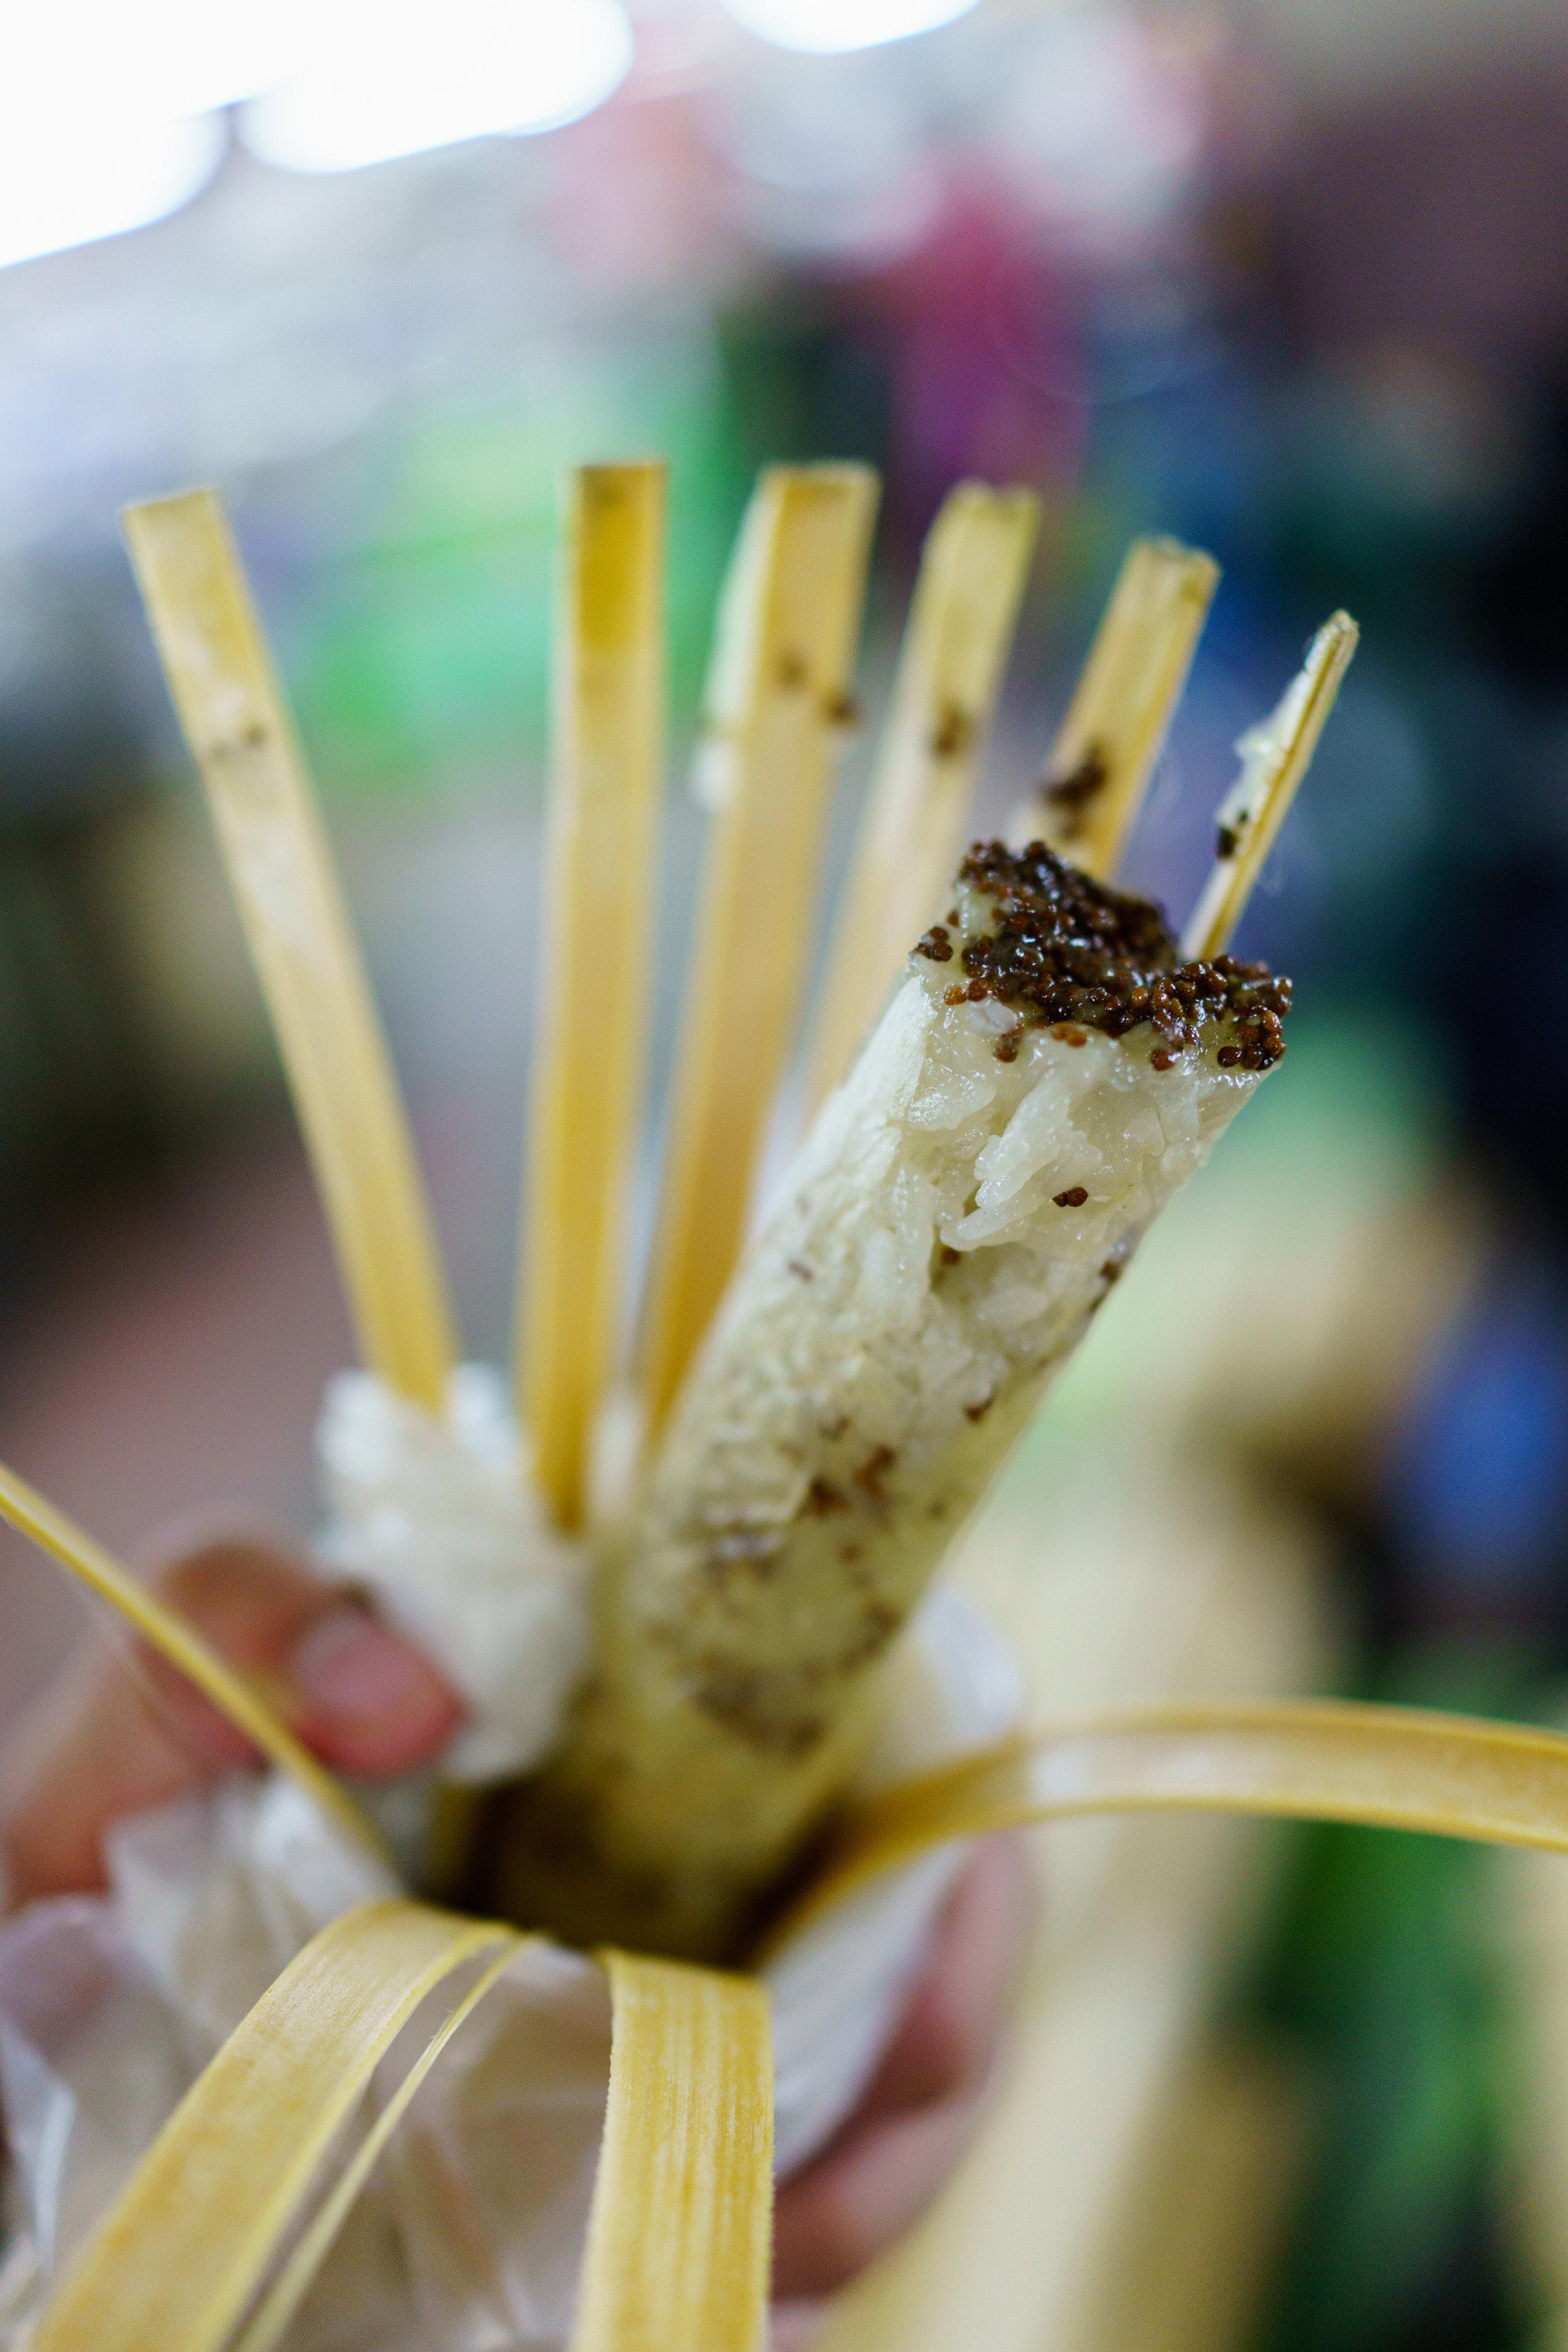 A tube of delicious sesame  khao lam